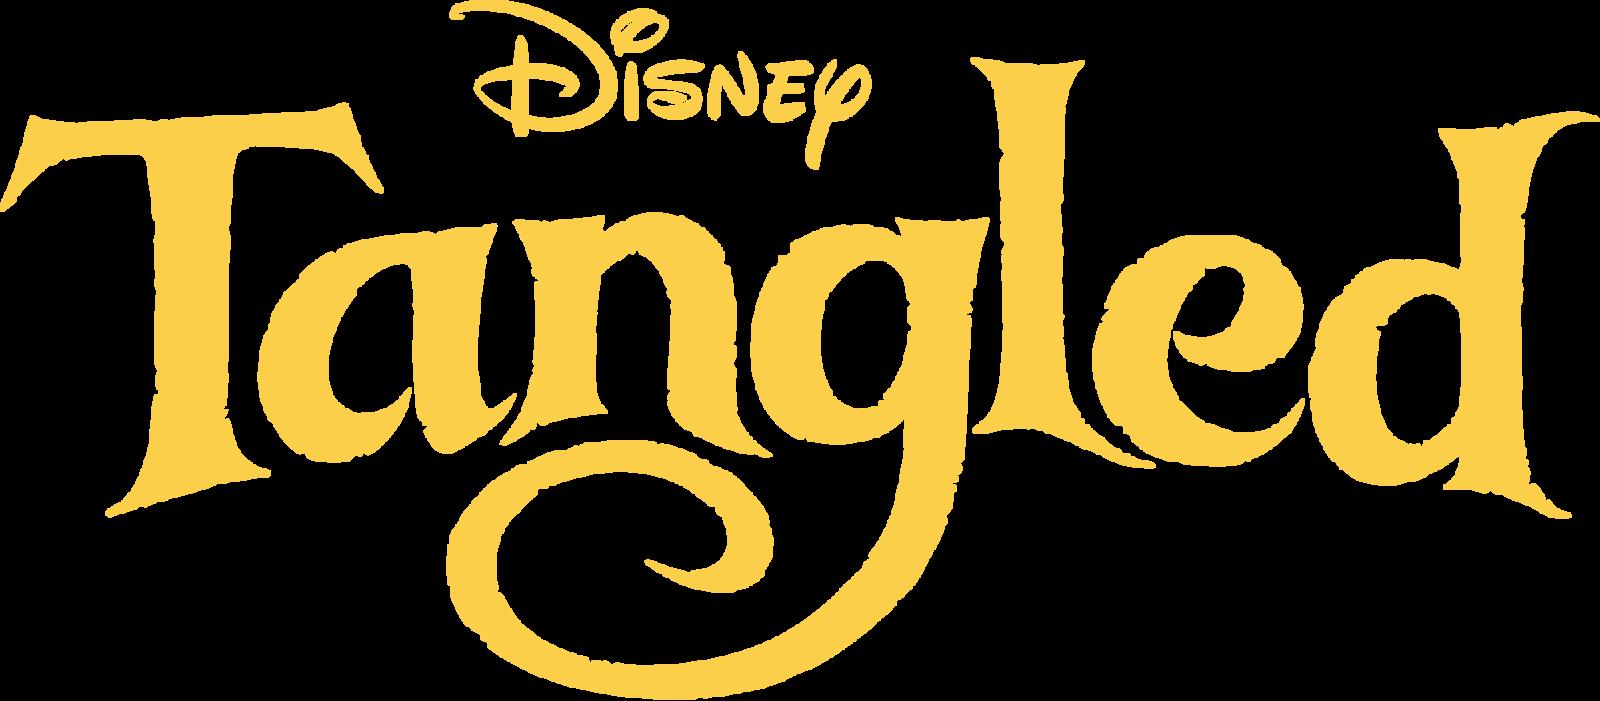 Tangled-gold-logo-entertainments-saga